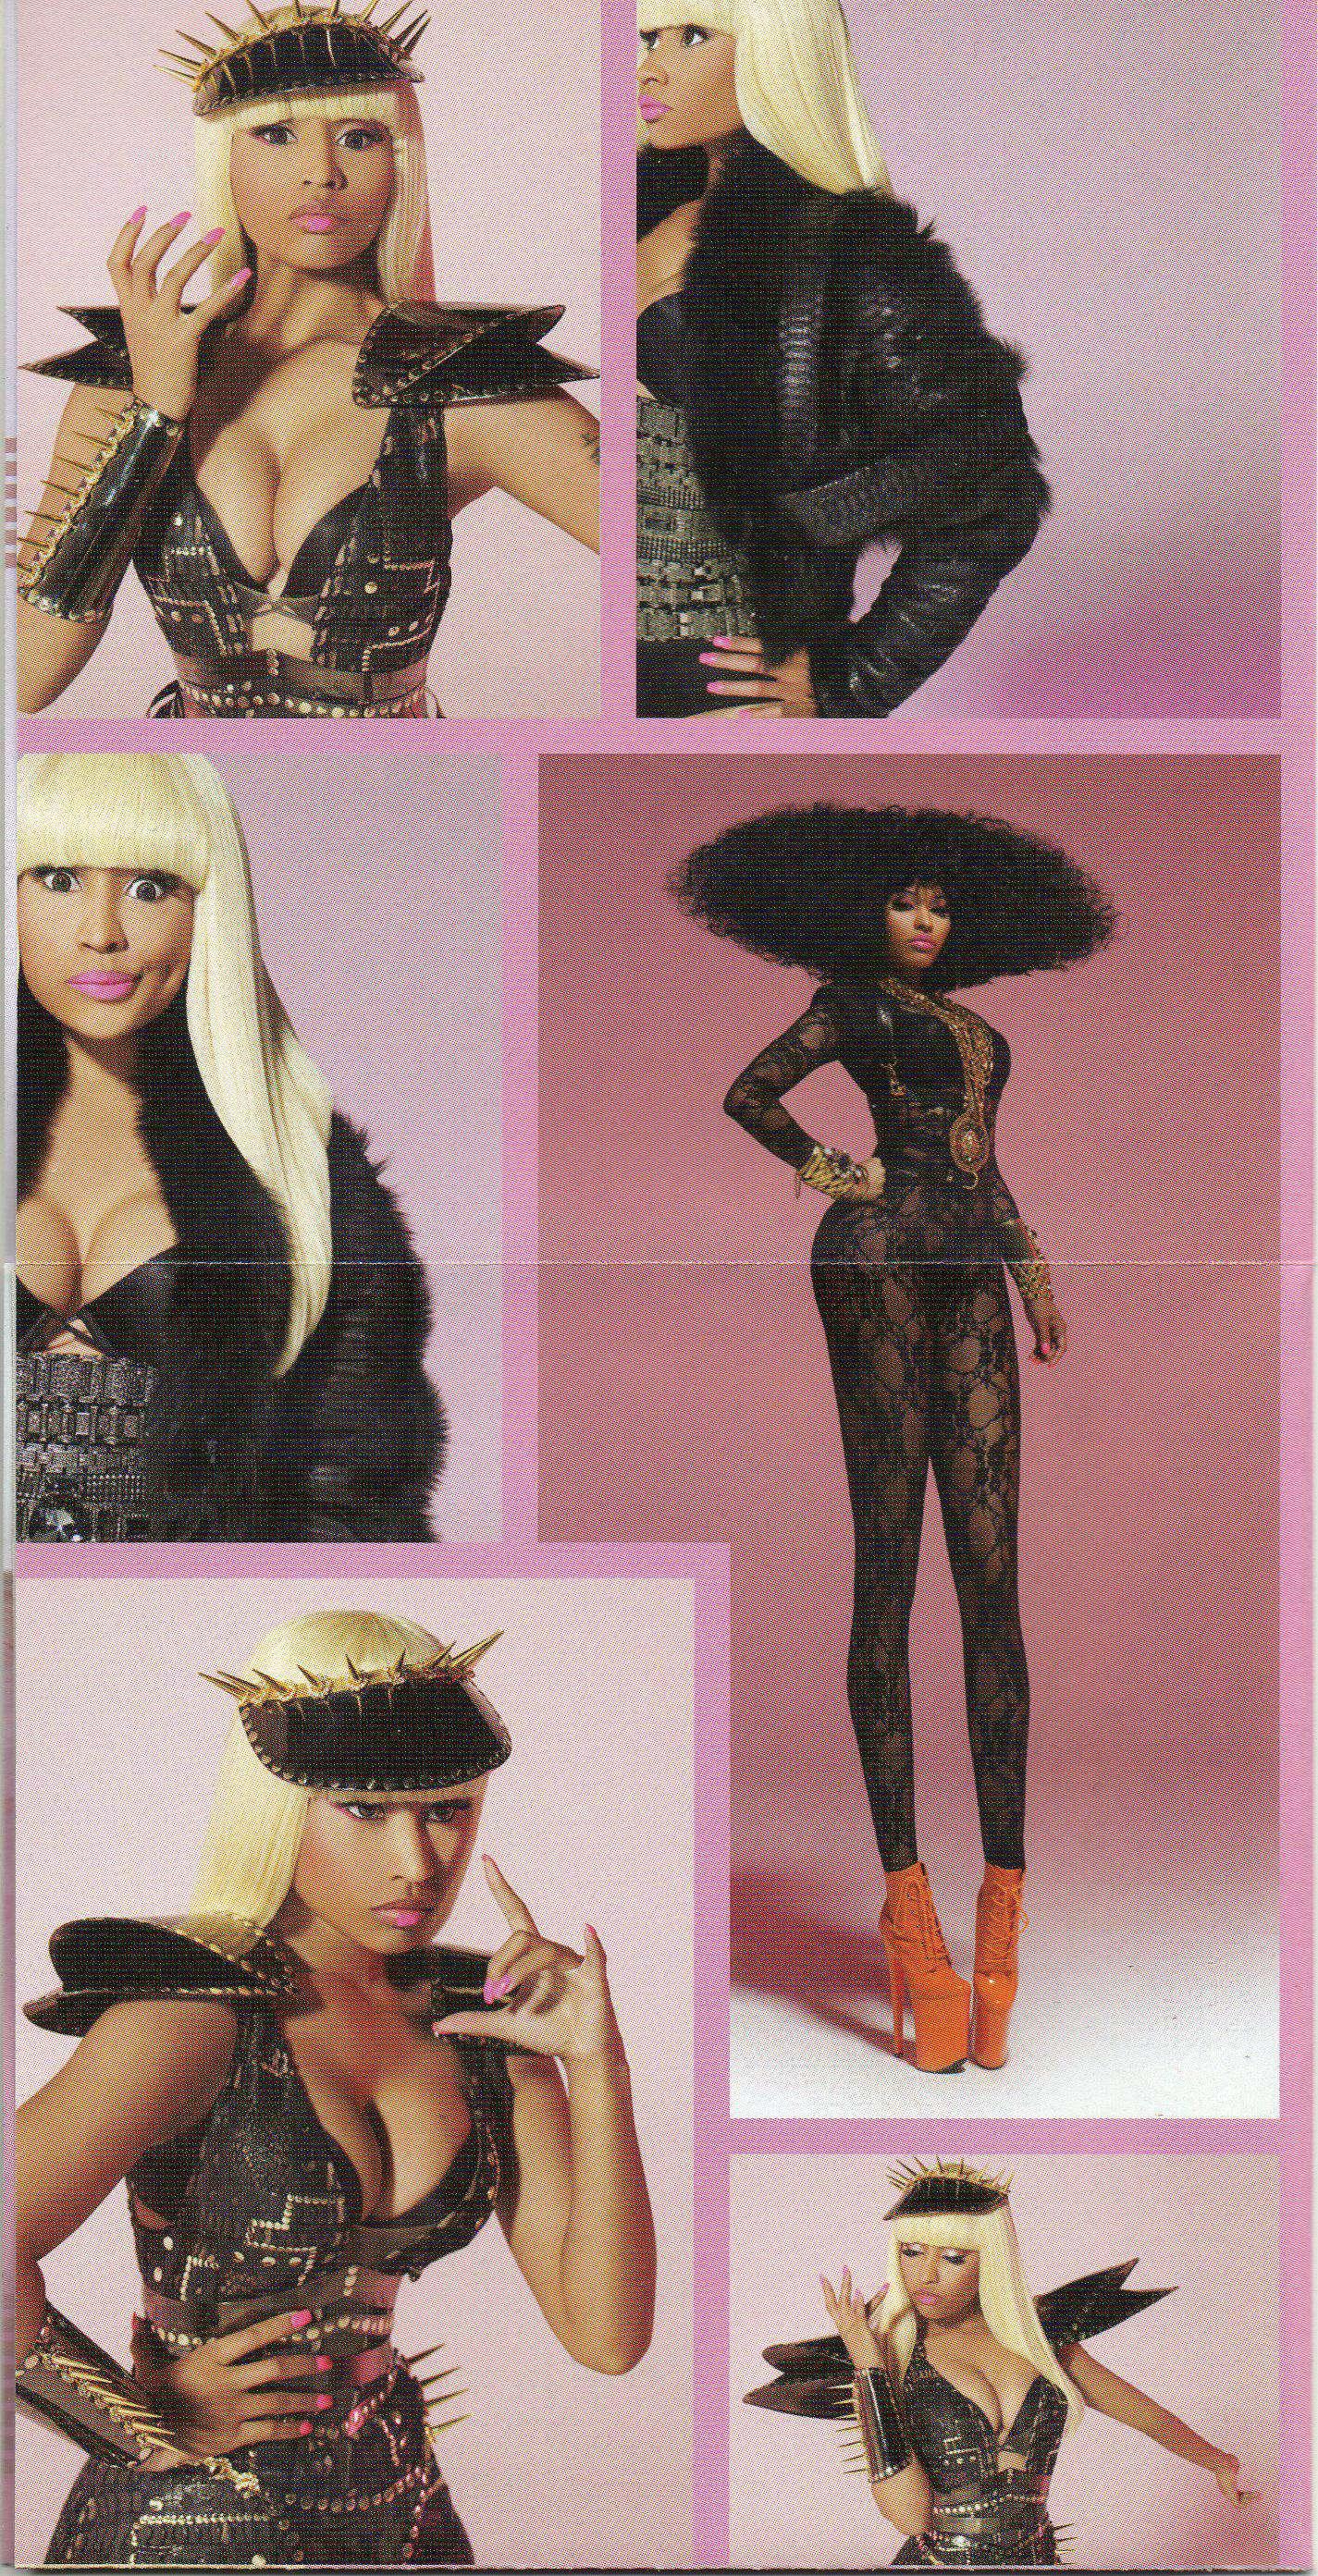 Tu colección de Nicki Minaj 9435521676a4485af6f52bd181404e81310df64